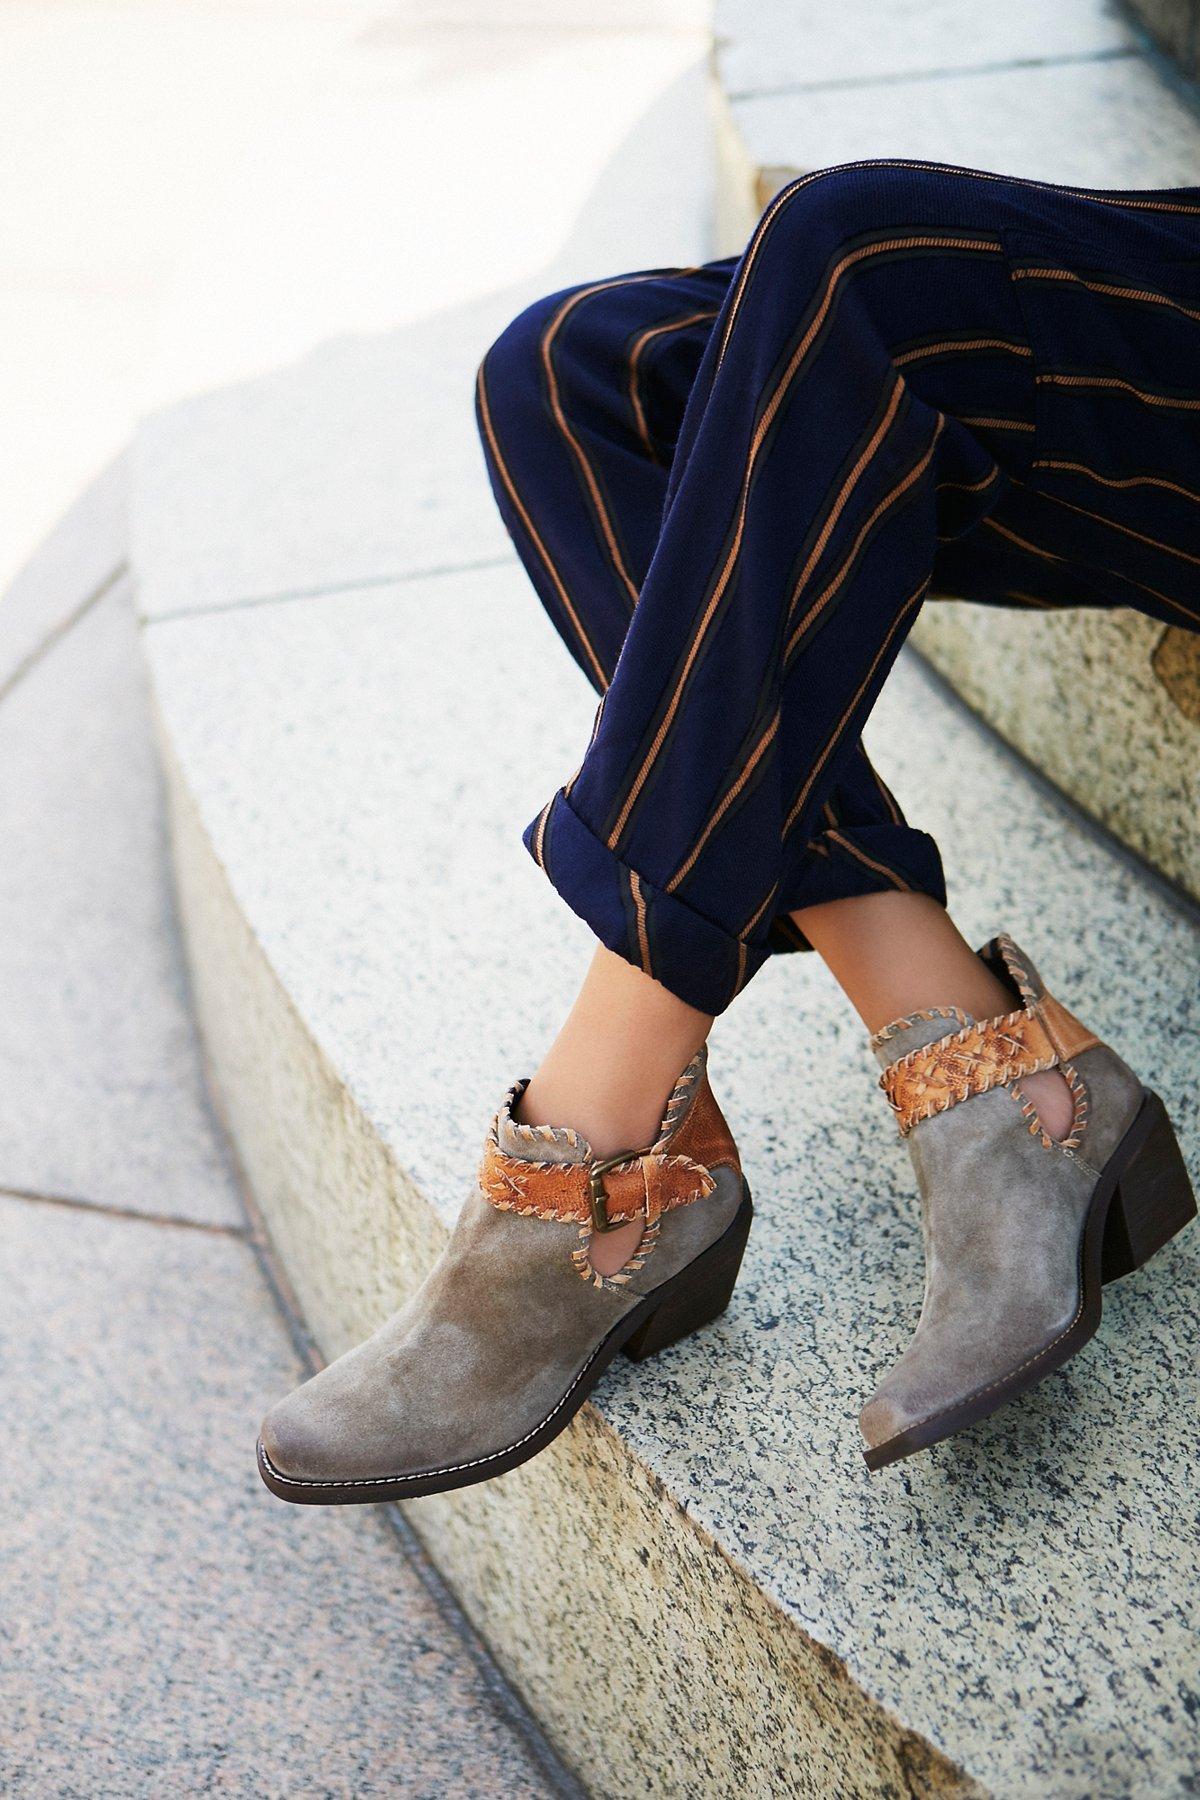 Walk The Line踝靴